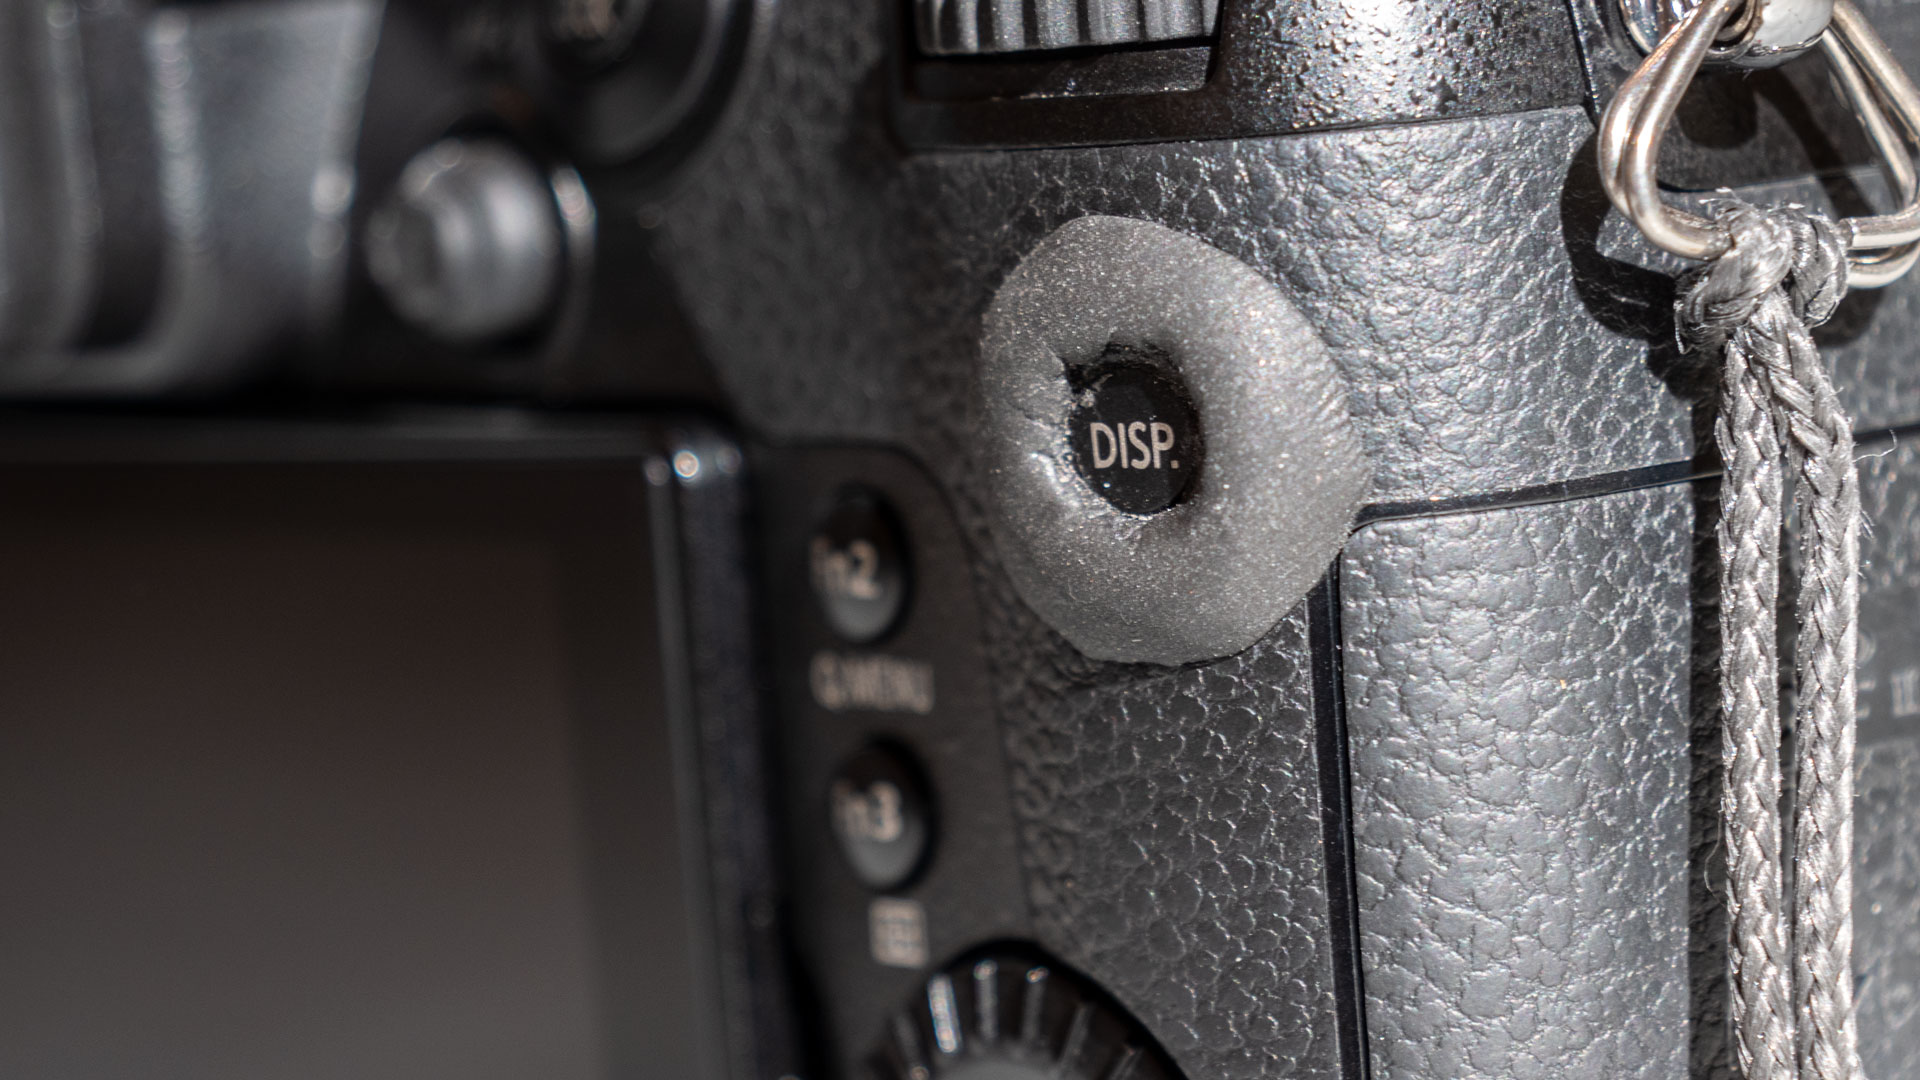 Sugru modification on my camera